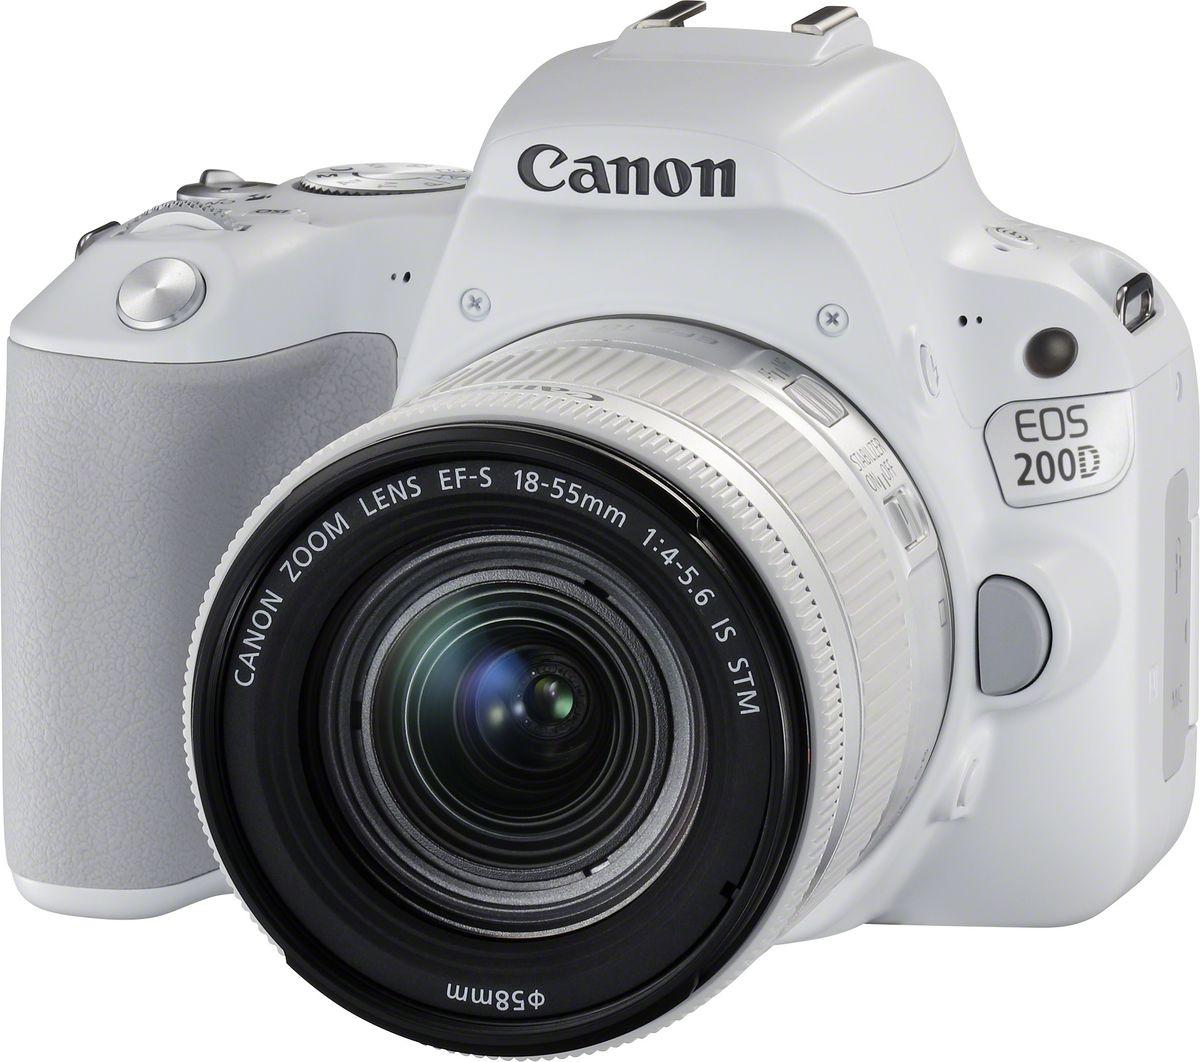 Зеркальный фотоаппарат Canon EOS 200D Kit 18-55 IS STM, White